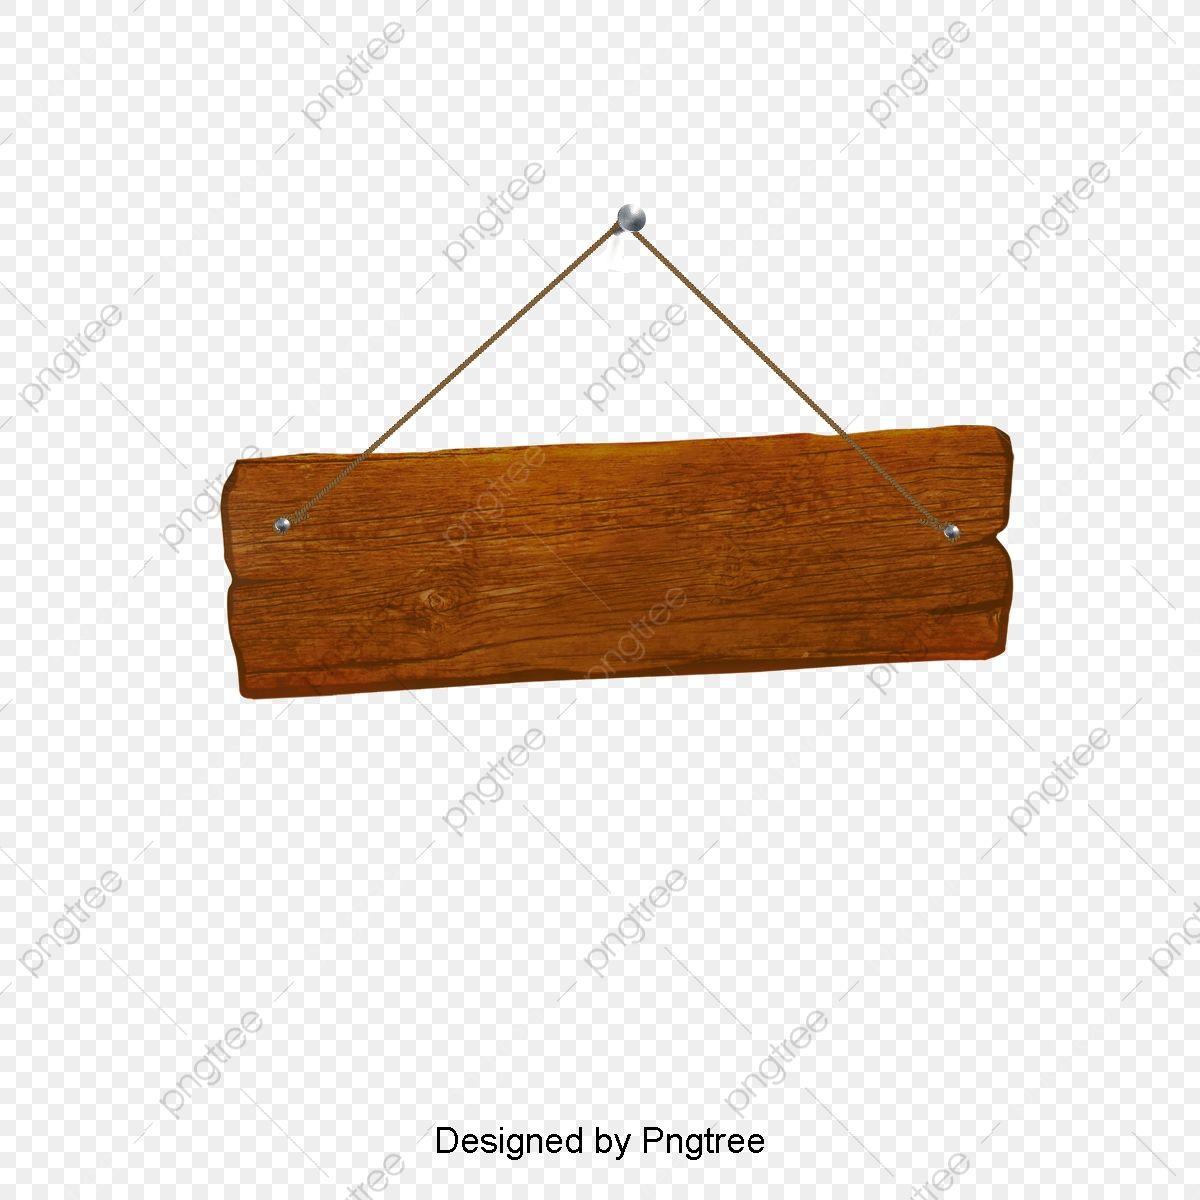 Letreros De Madera Vector Diseno De Tablon Firmar Tablon Madera Png Y Psd Para Descargar Gratis Pngtree Wood Signs Birthday Wishes Gif Wood Texture Background